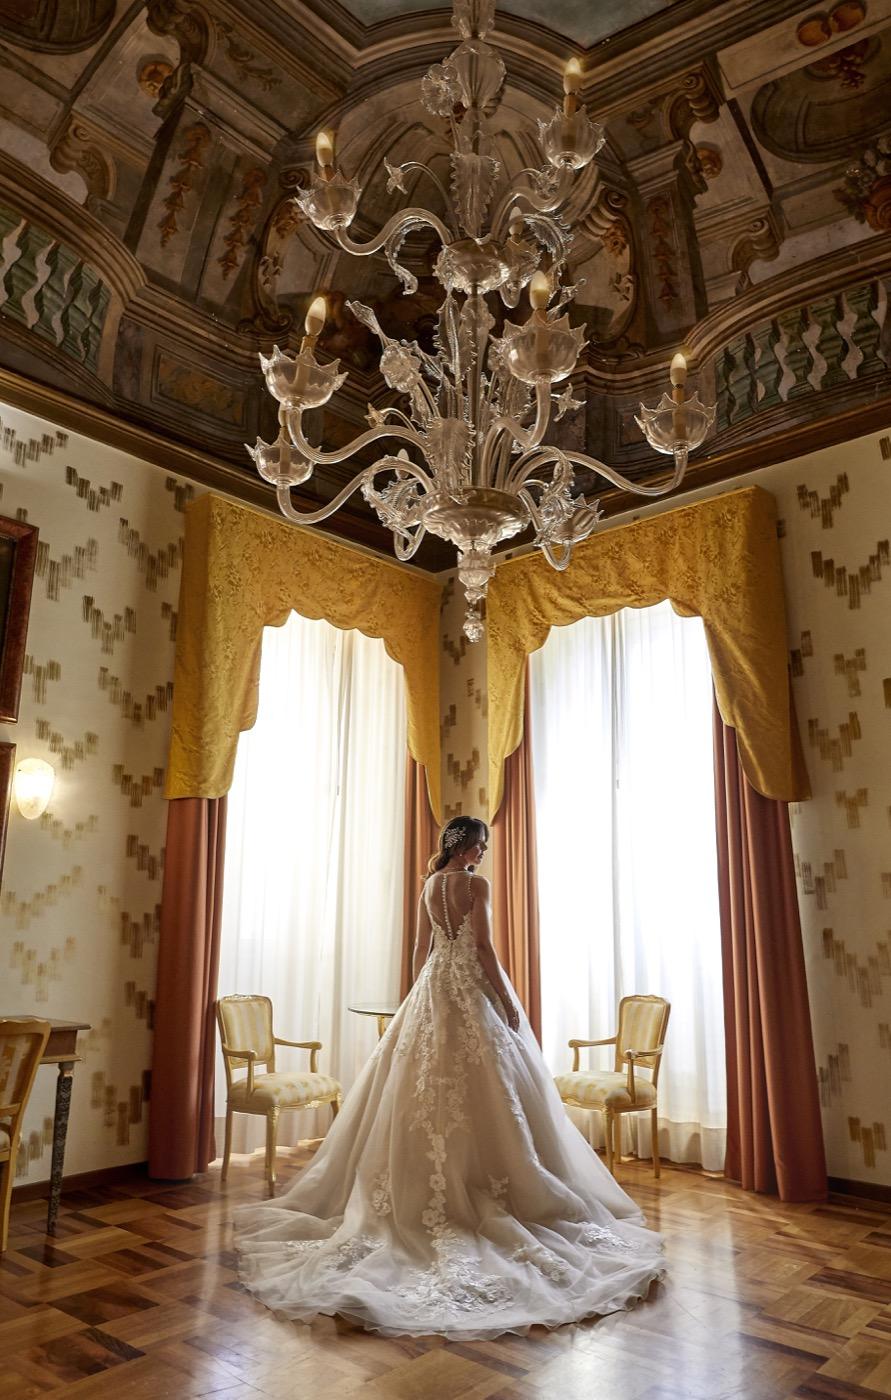 Claudio-Coppola-wedding-photographer-la-scuderia-eventi-preparativi-la-rosetta-perugia-32